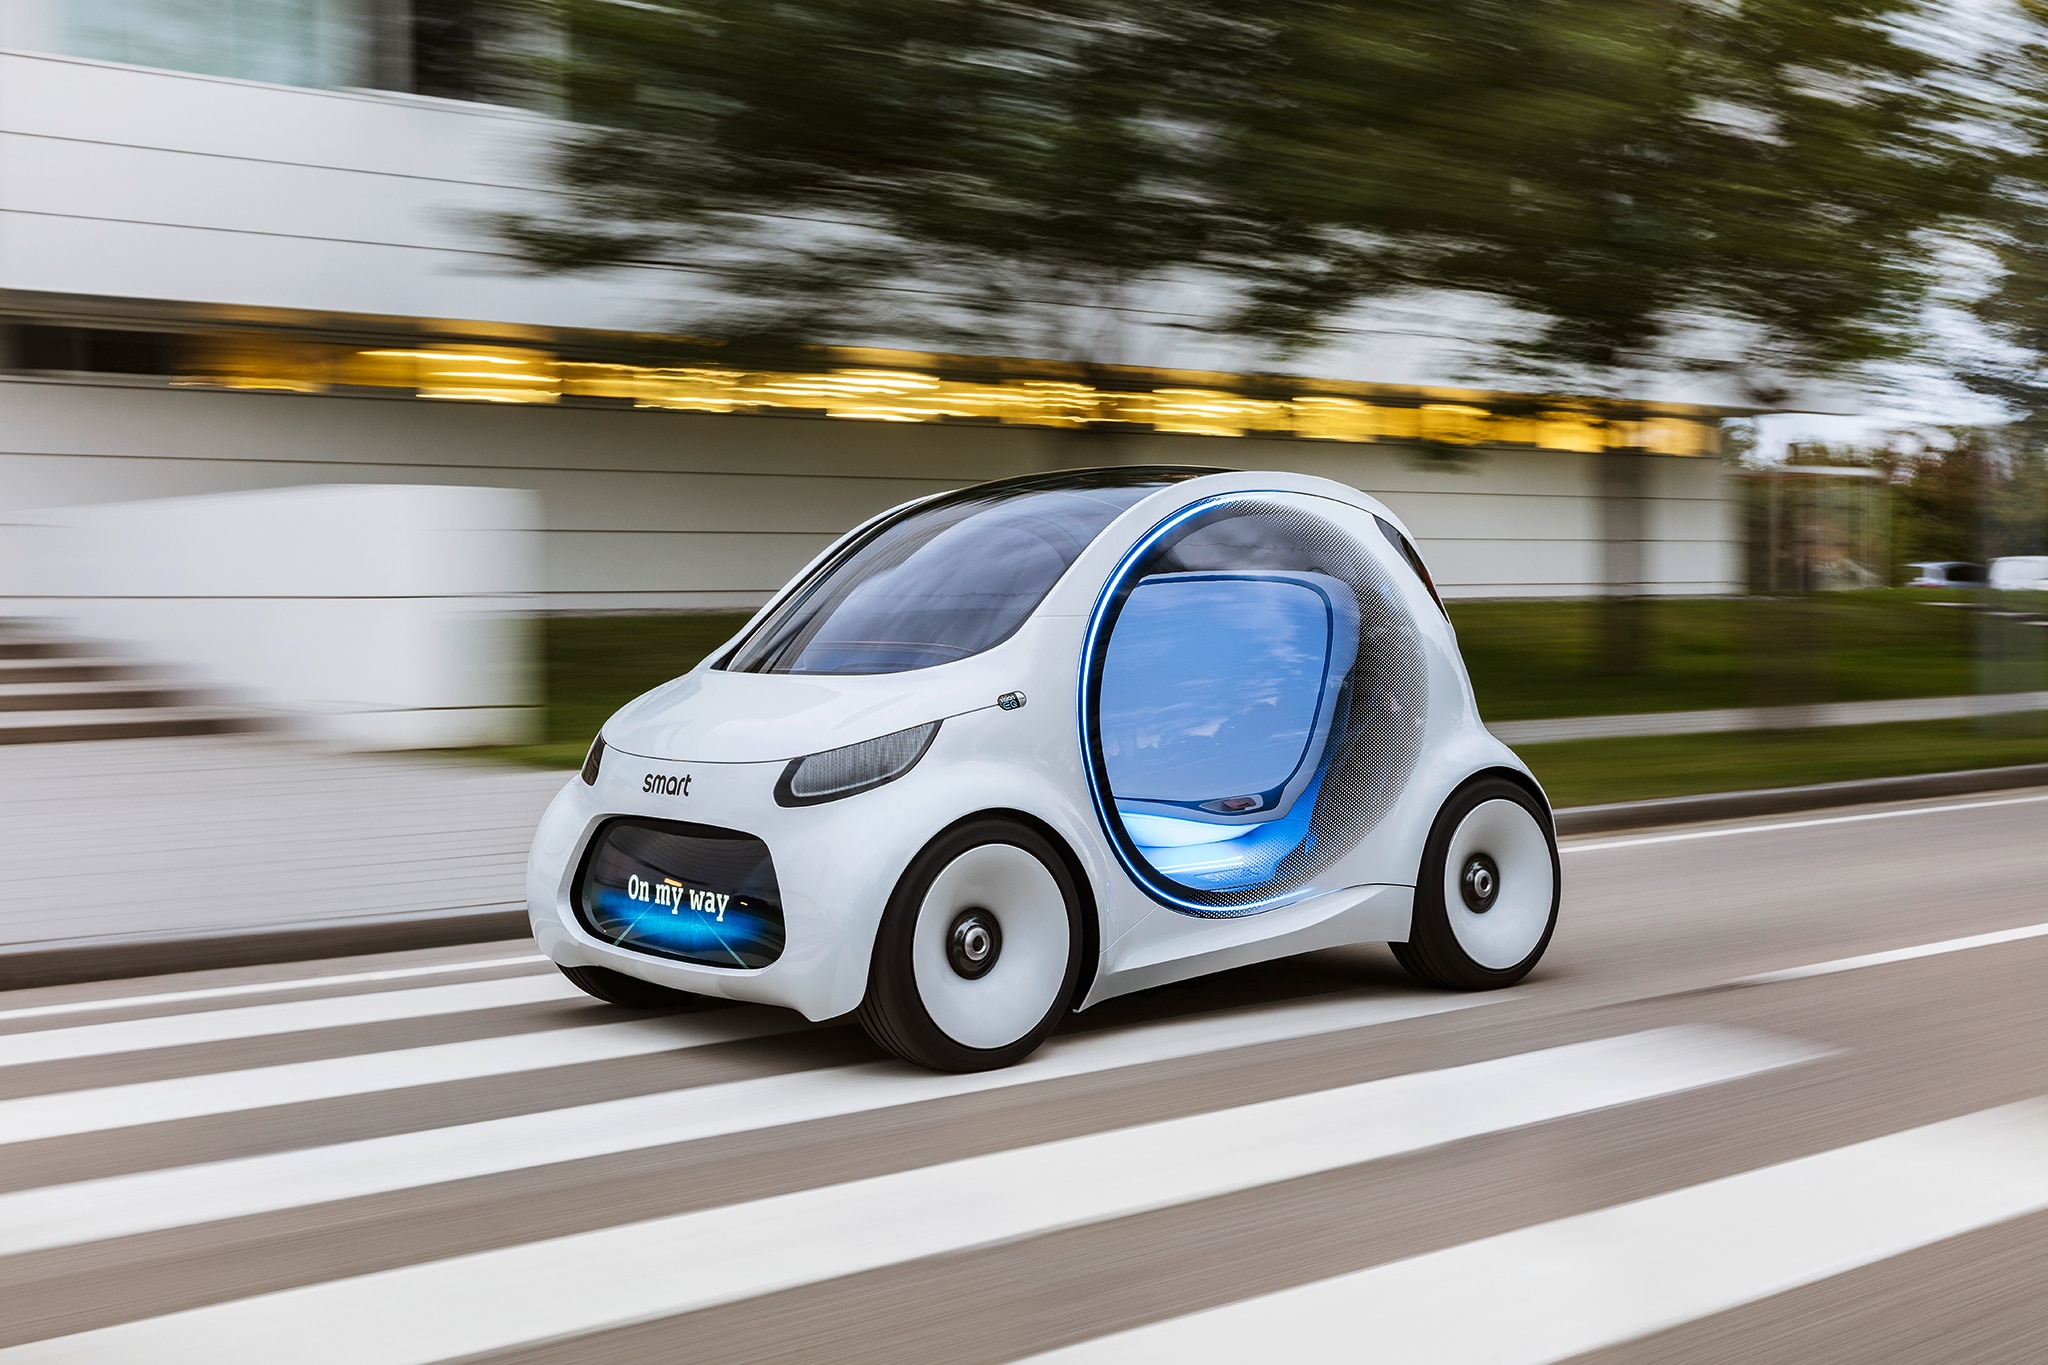 Smart Vision EQ Fortwo Autonomous Concept Car Front Three Quarter In Motion 02